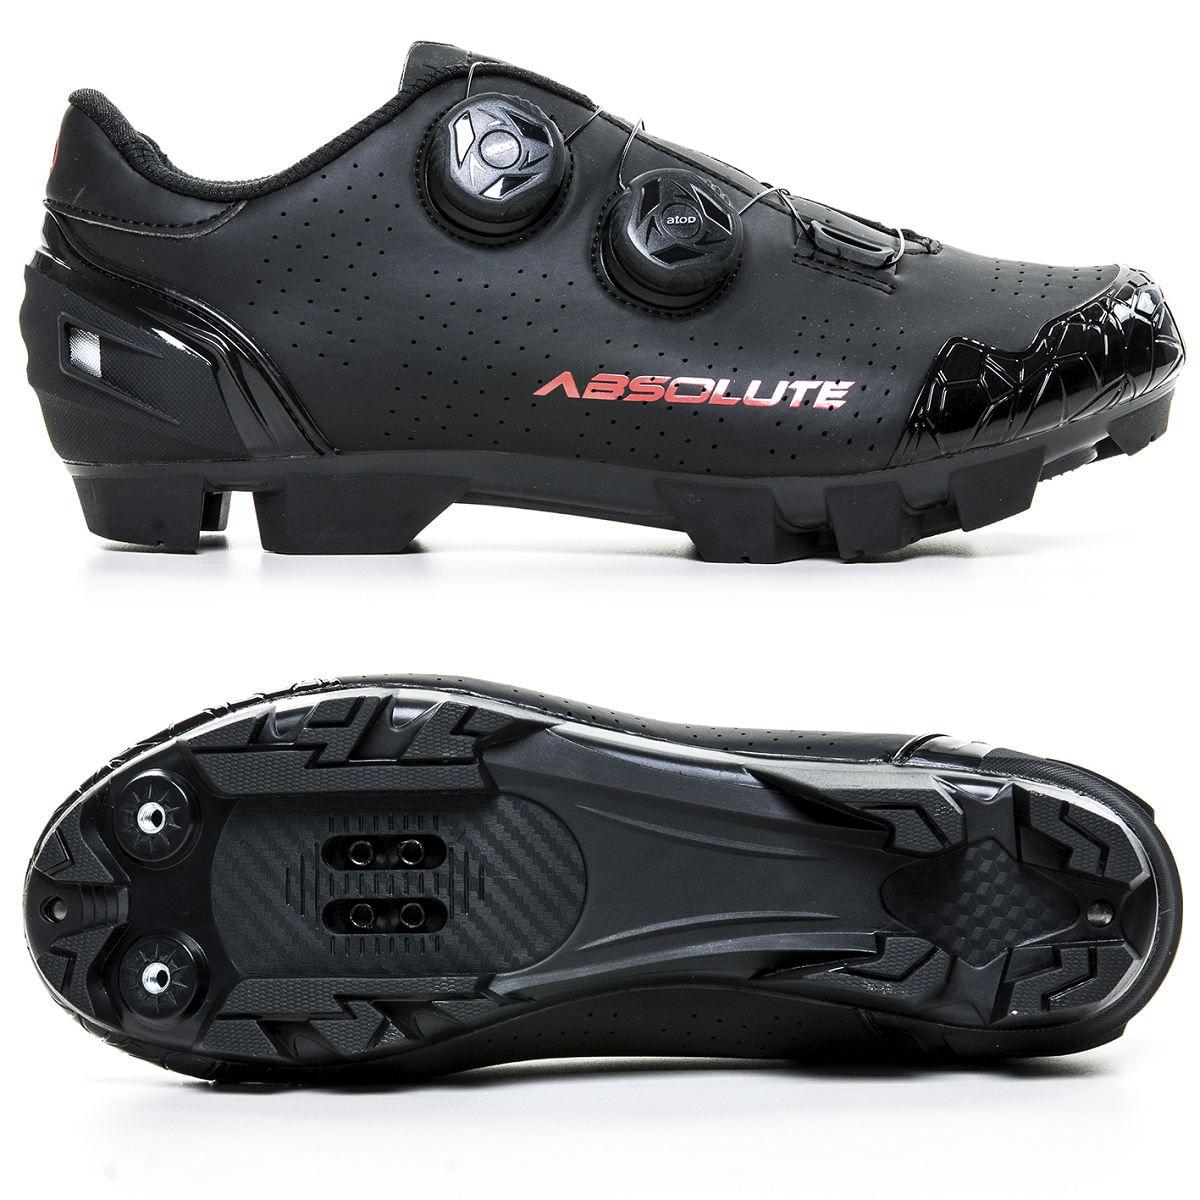 Sapatilha-para-Bike-MTB-Absolute-Prime-Preto-Fosco---9698--1-